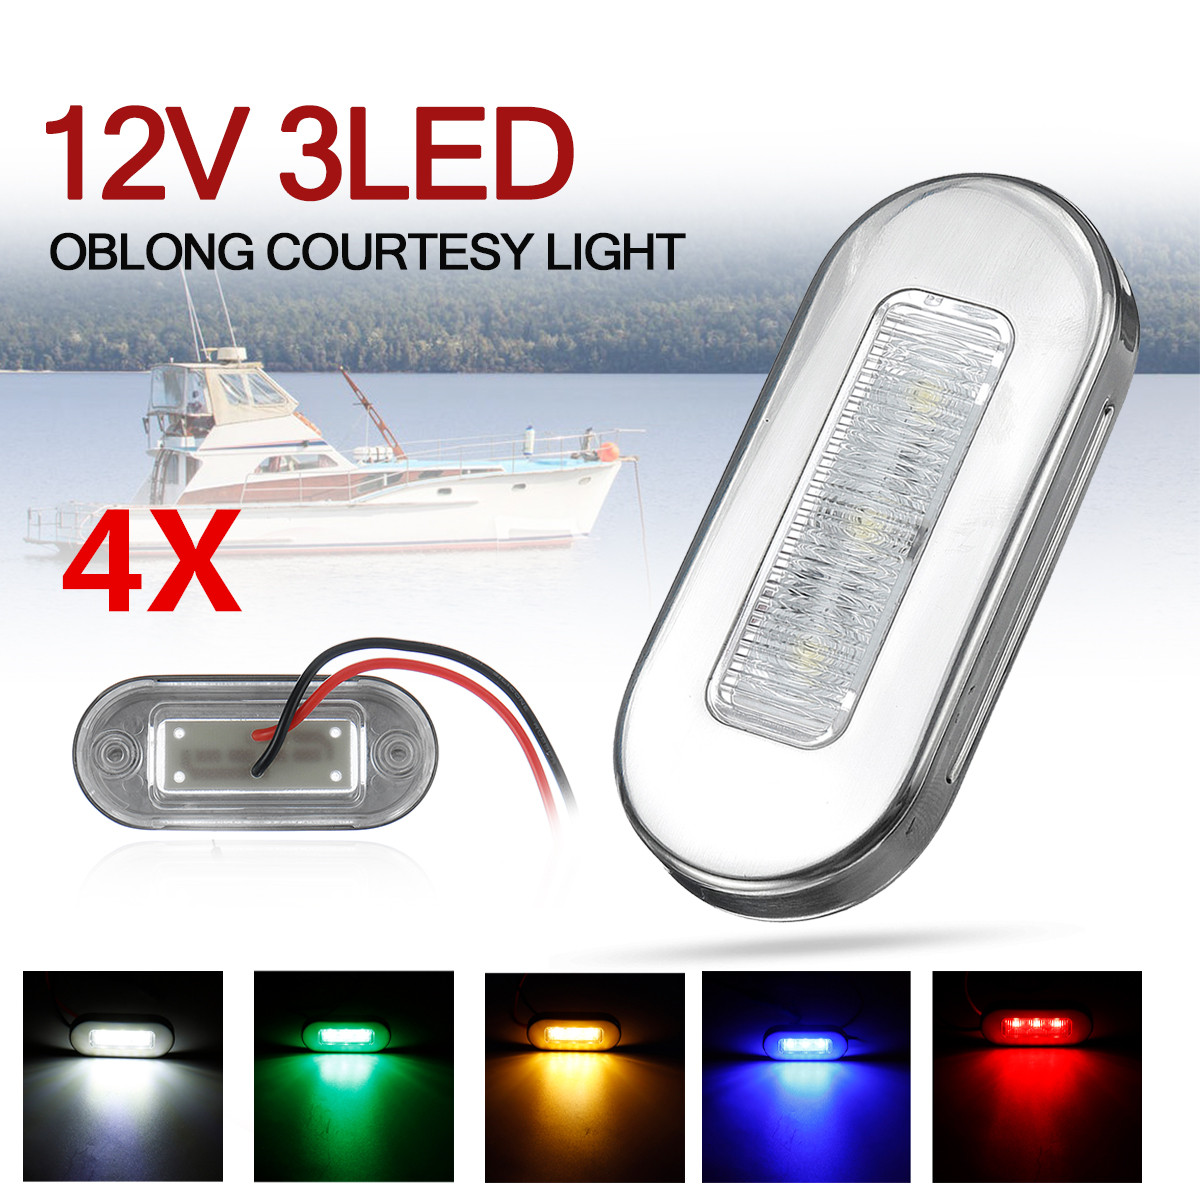 4 pcs 12v 3 led barco escada deck lado marcador luz de cortesia luzes indicadoras turn